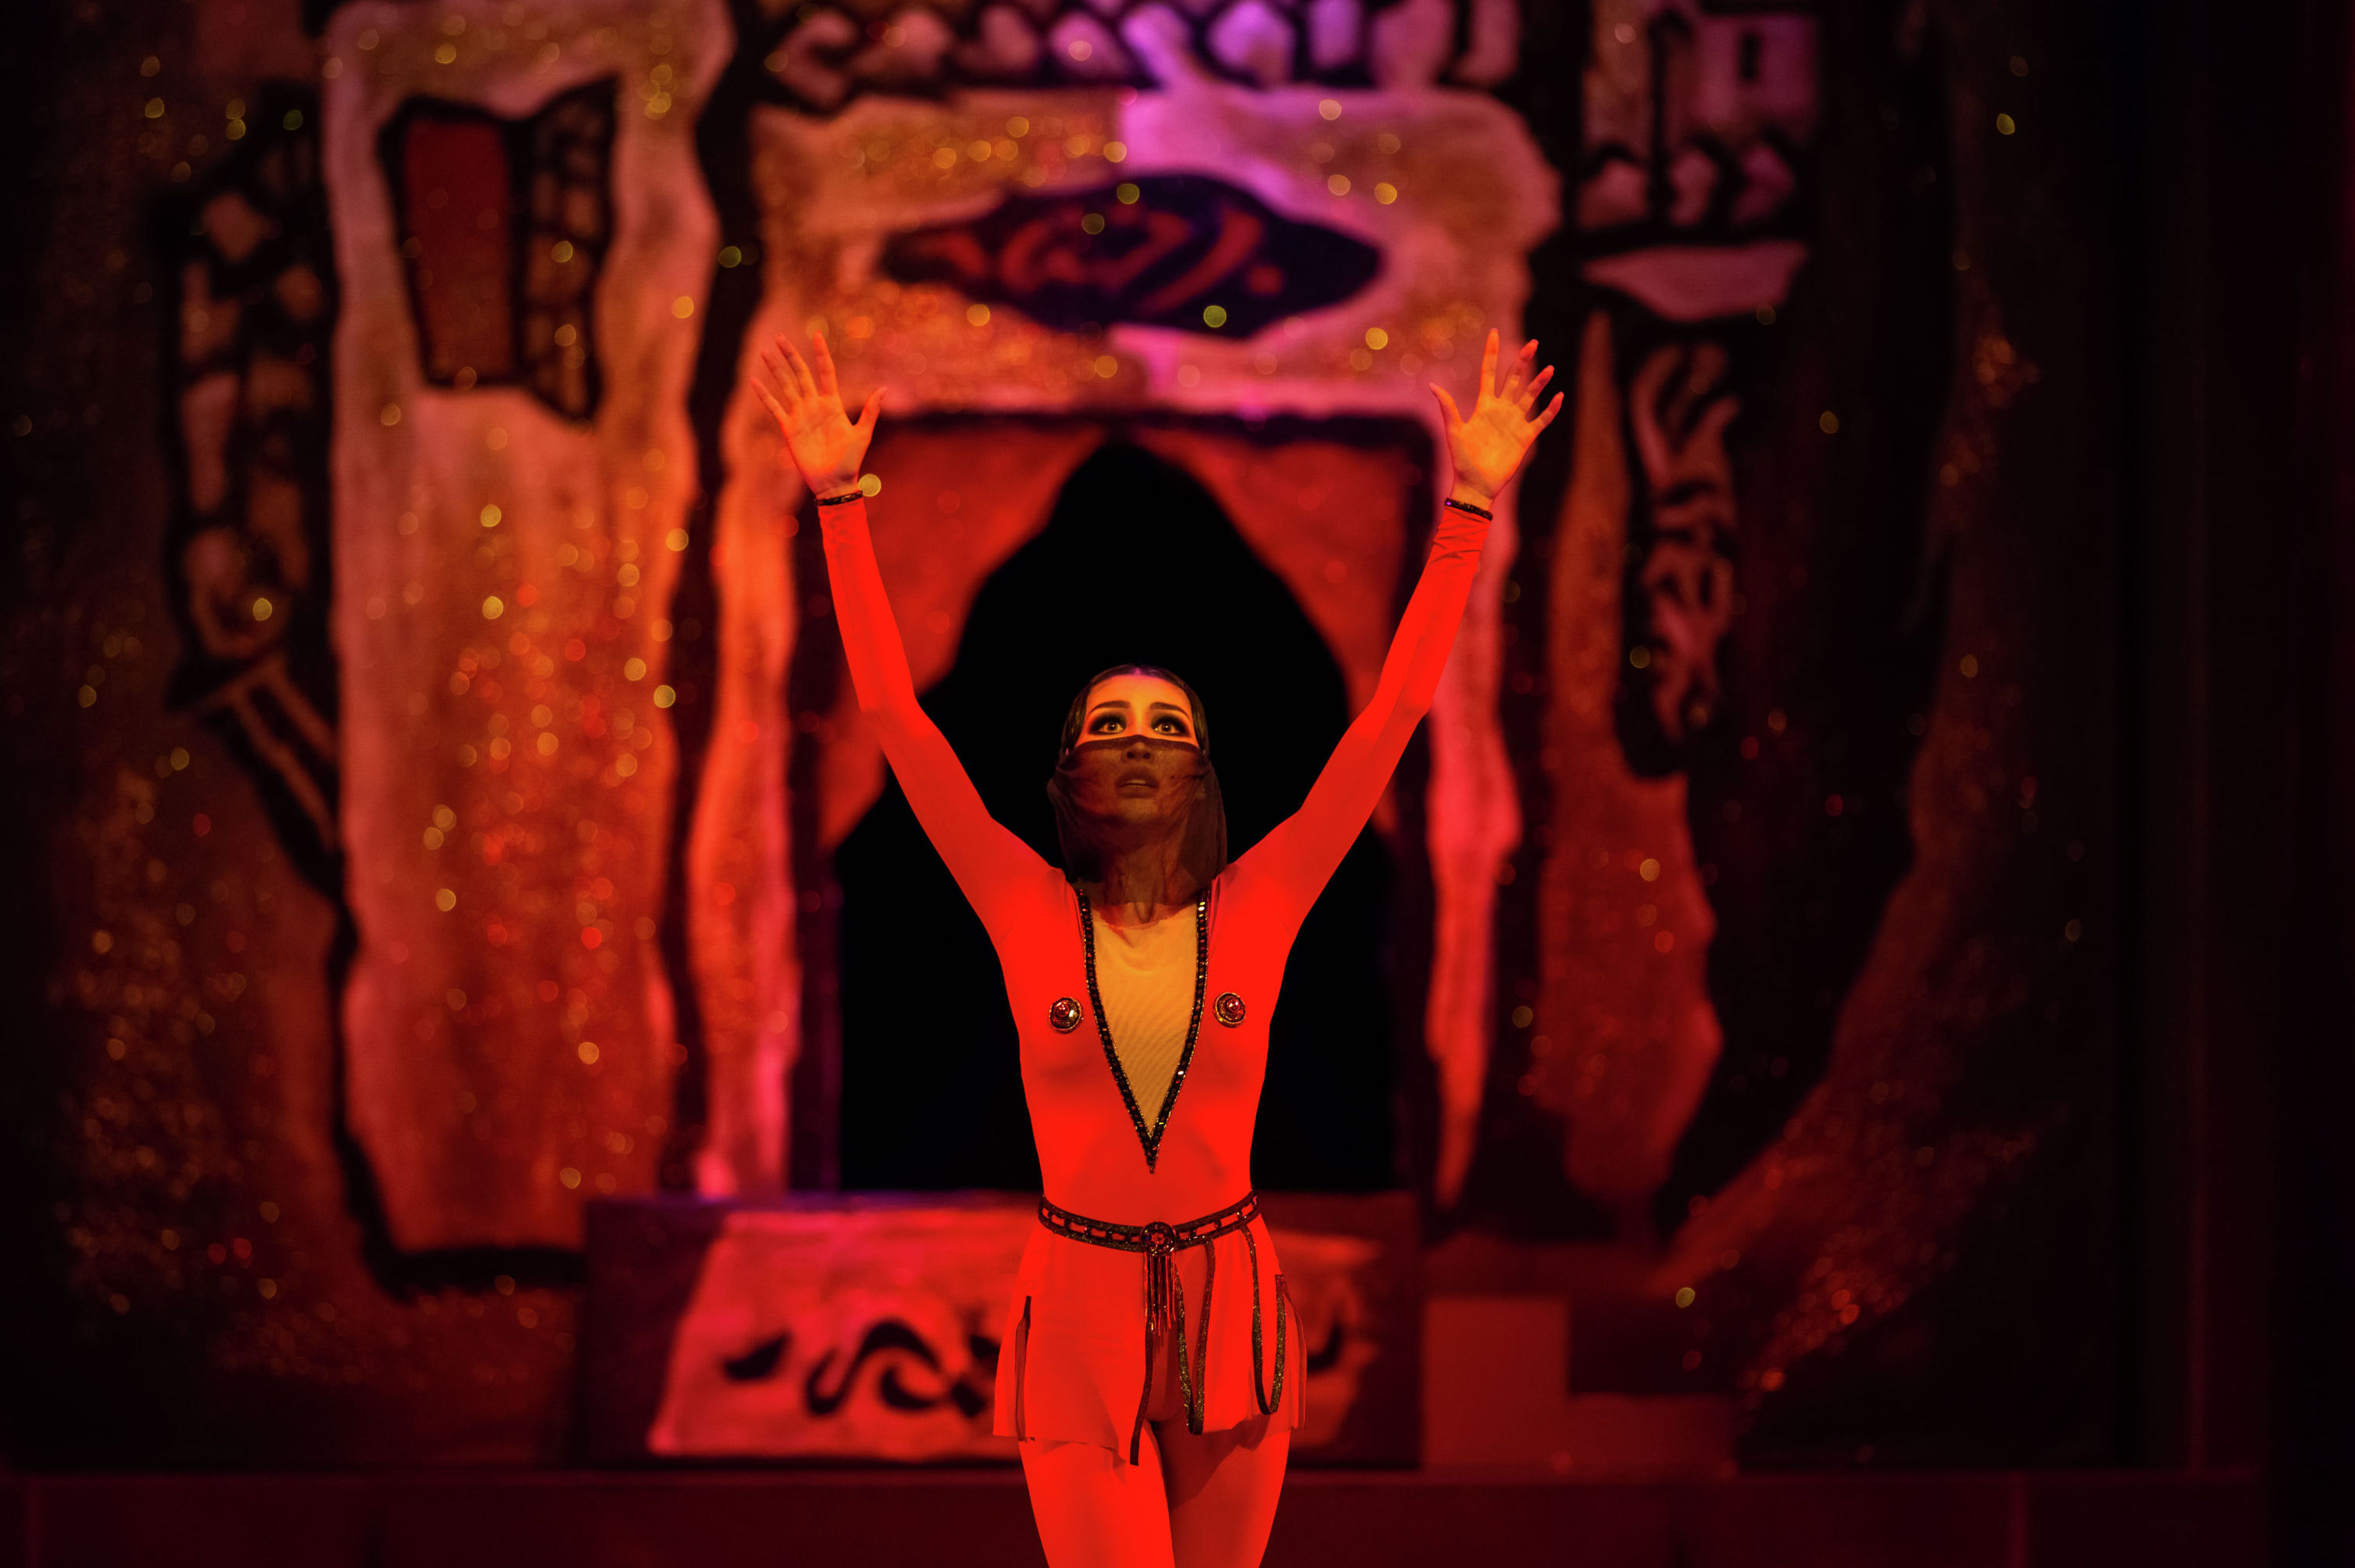 На фото ведущая солистка Театра Астана Балет - Айжан Мукатова